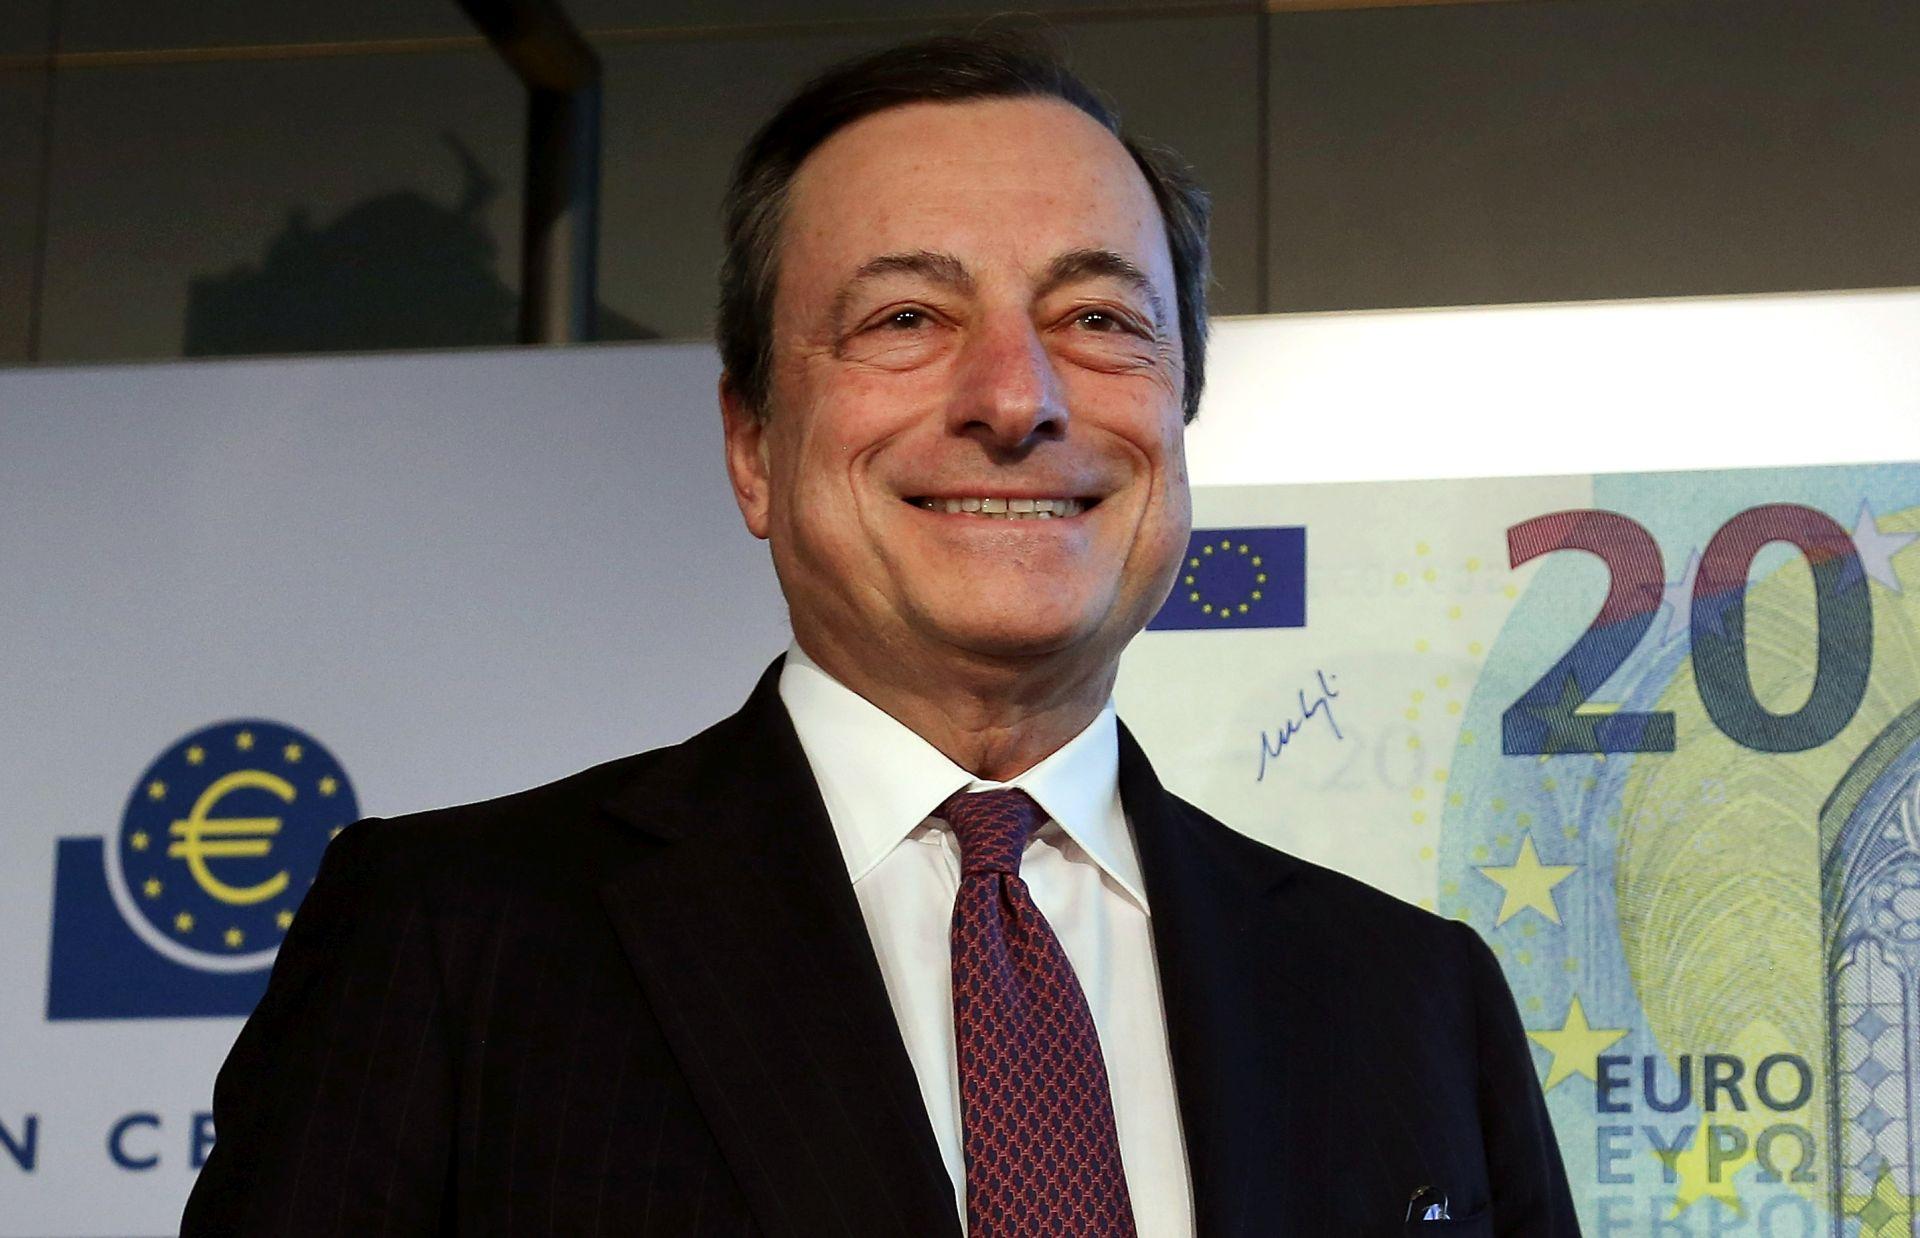 CRNE PROGNOZE Draghi sumnja da će Grčka izbjeći bankrot